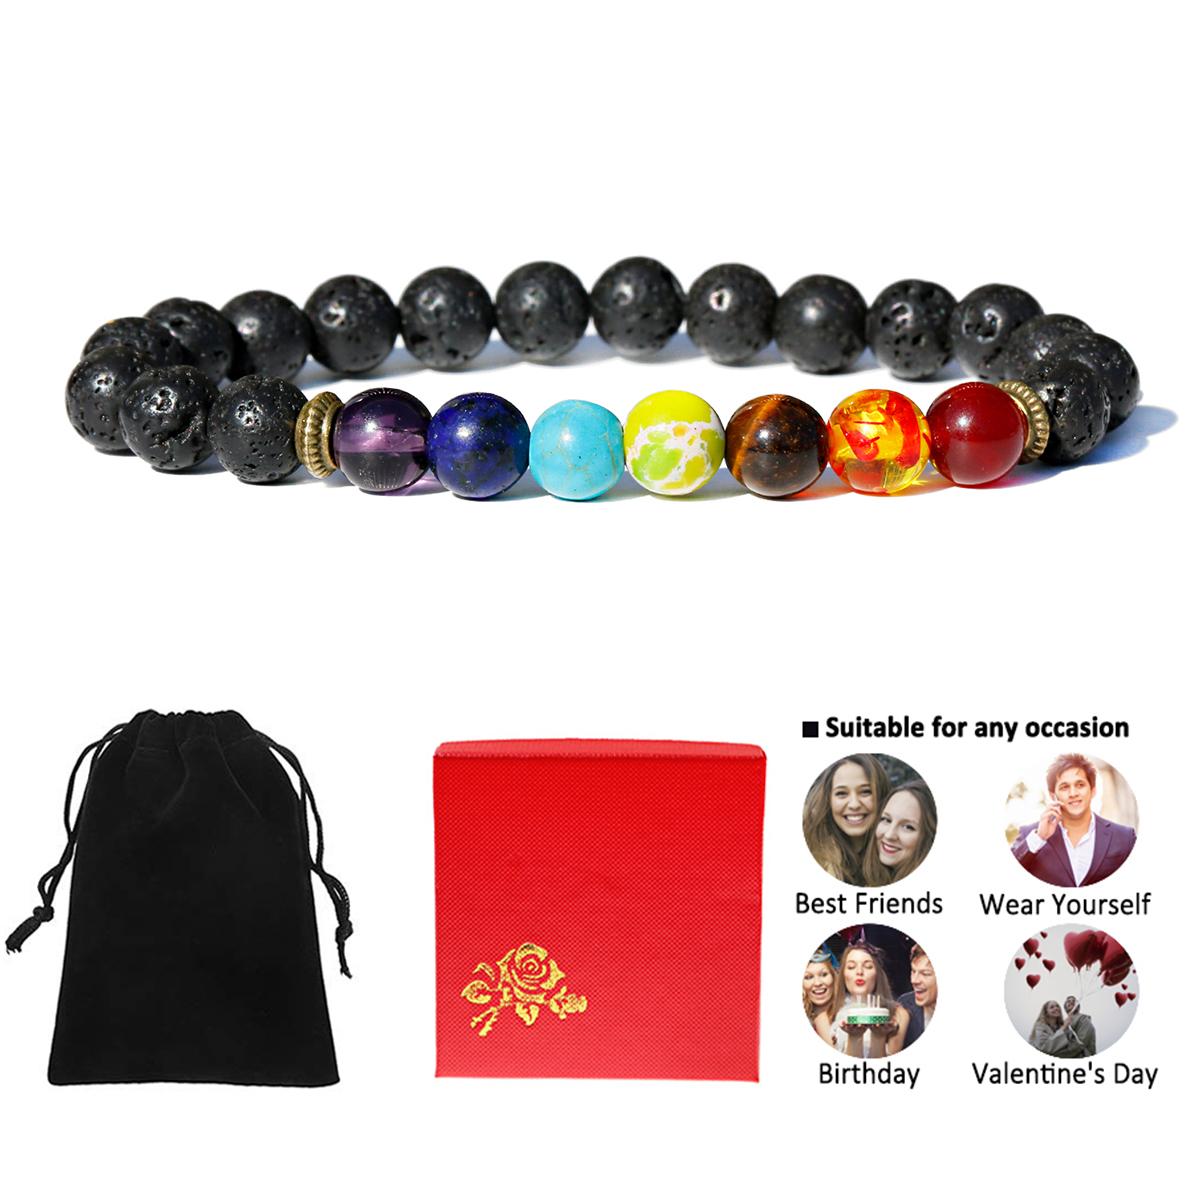 Rainbow Bracelet 7 Chakra Bracelet Fathers Day Gift Chakra Bracelet SET of 2 Chakra Bracelets Unisex Yoga Bracelet Gift for Dad